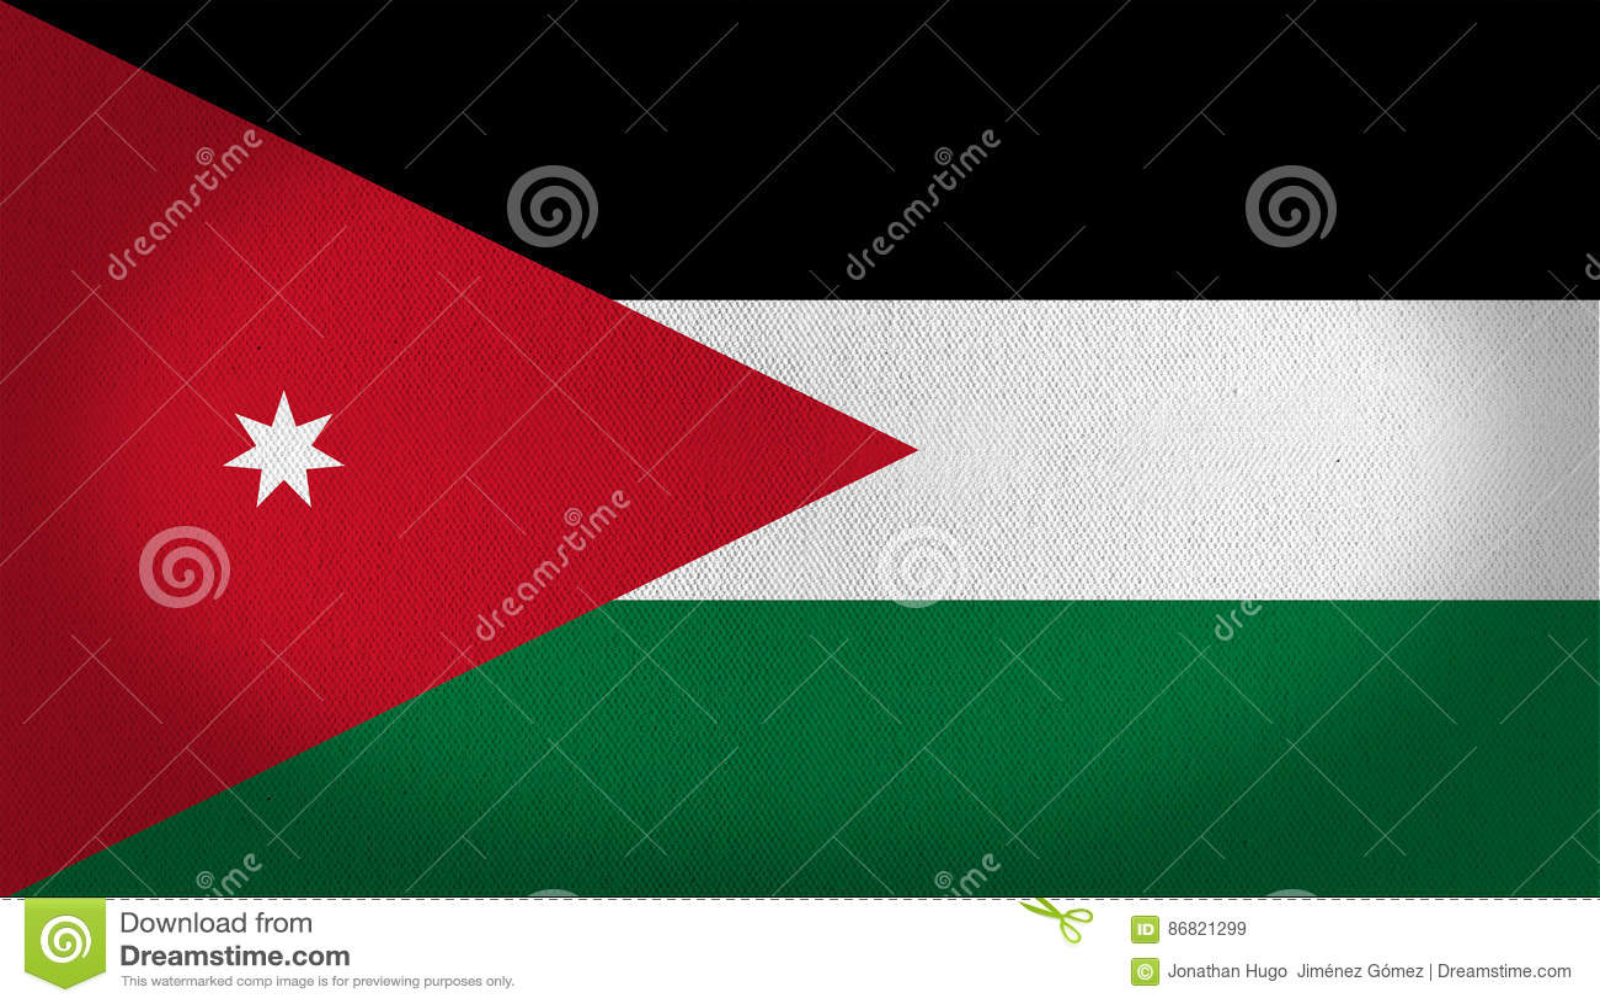 Jordan Flag Stock Illustration Illustration Of Texture 86821299